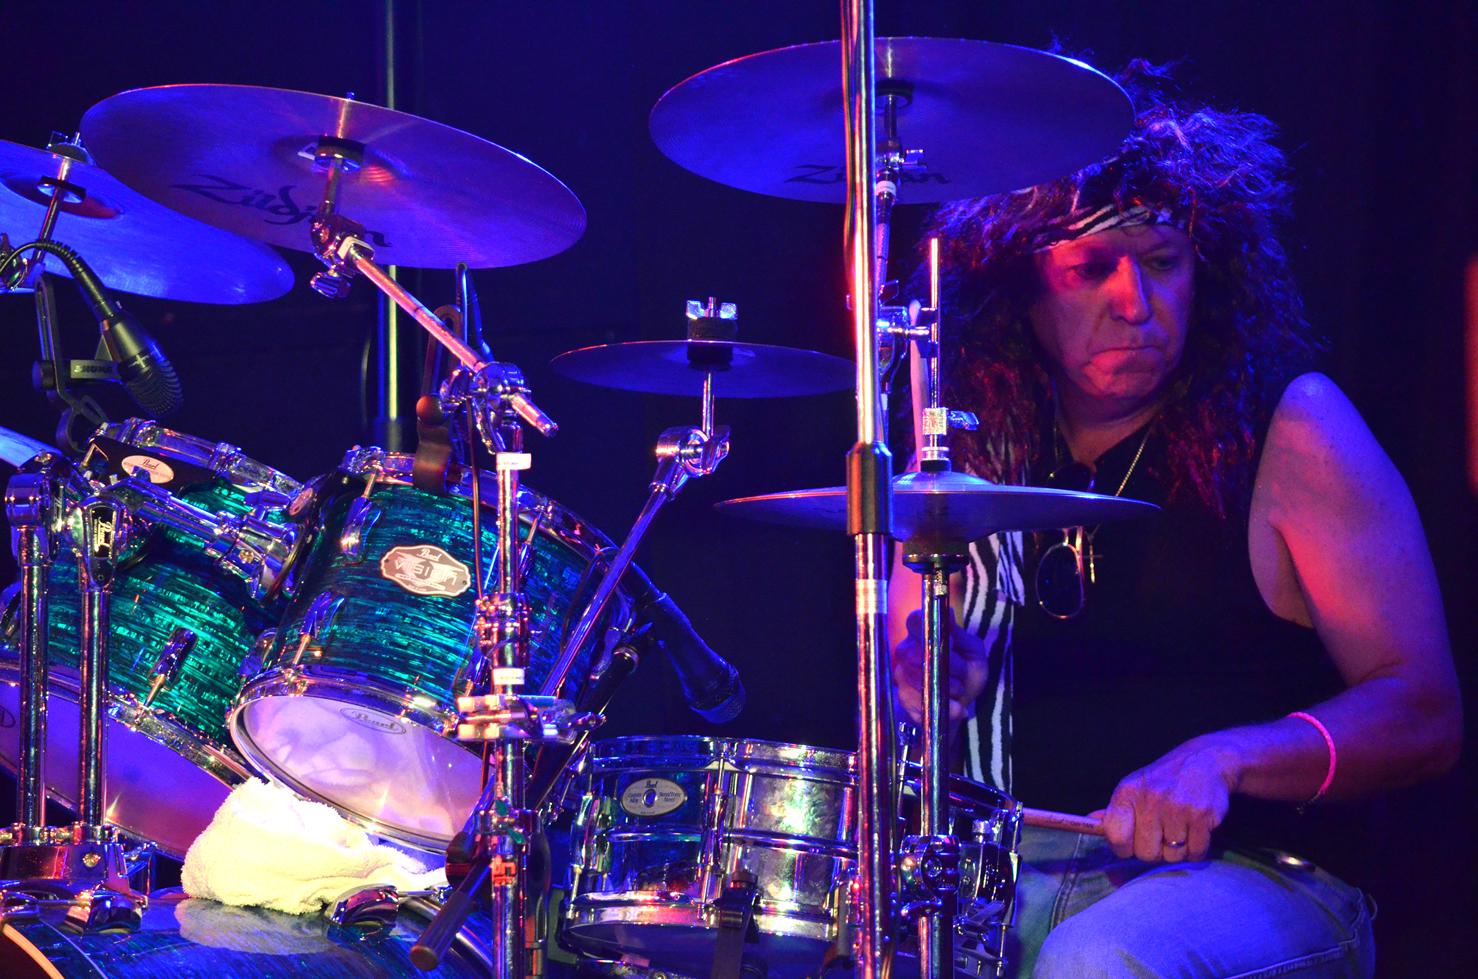 Frank on drums